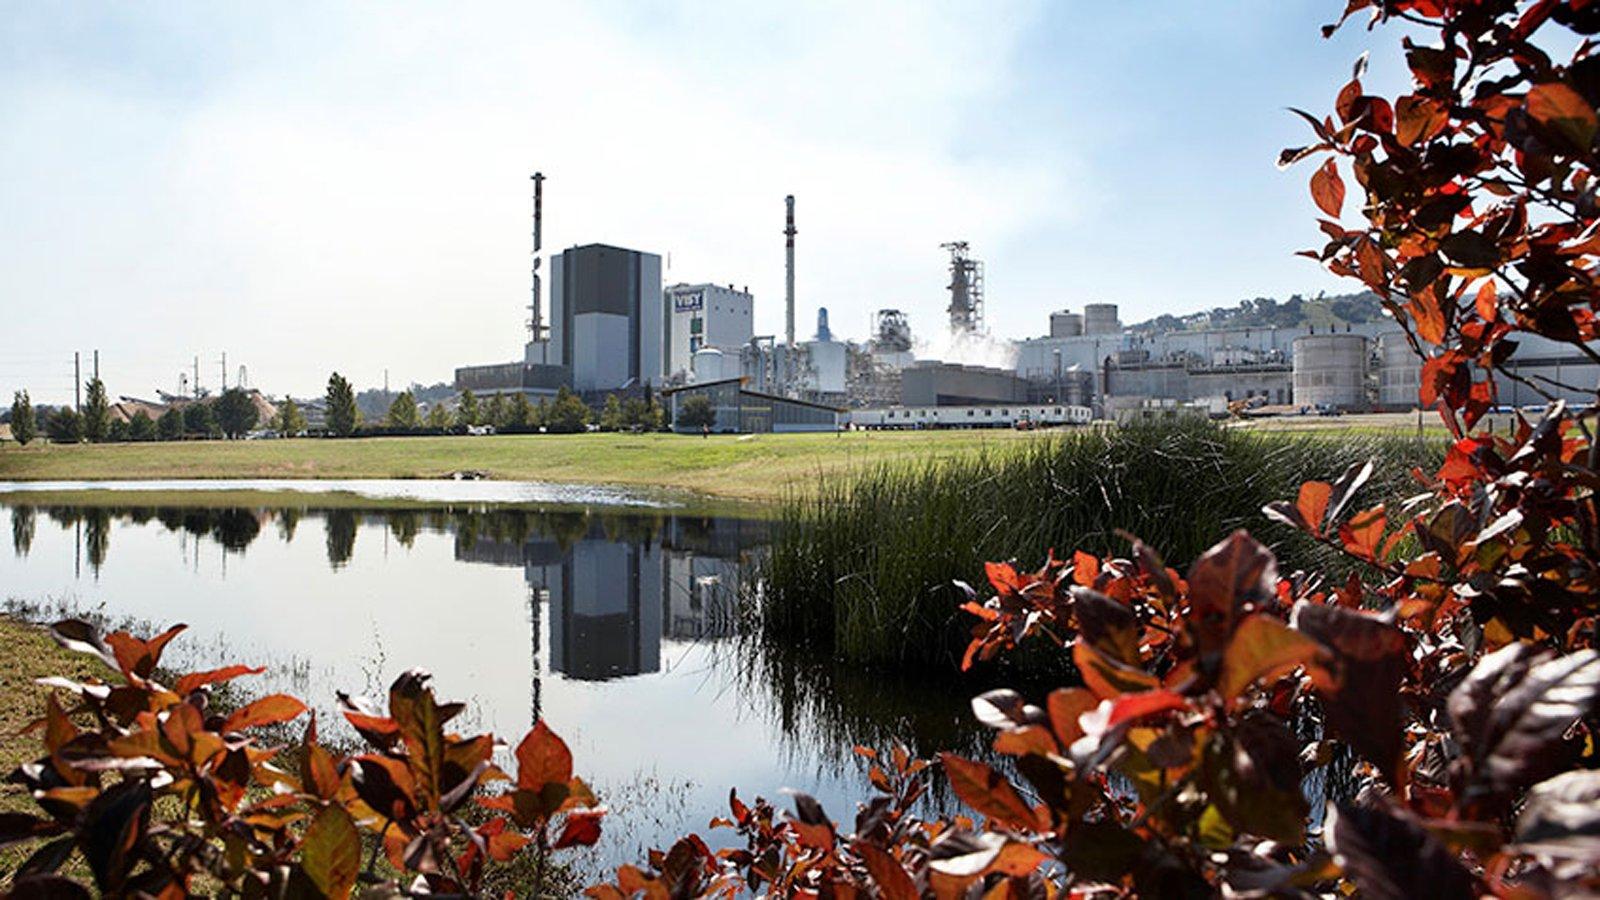 Visy社の製紙工場での紙生産の推進